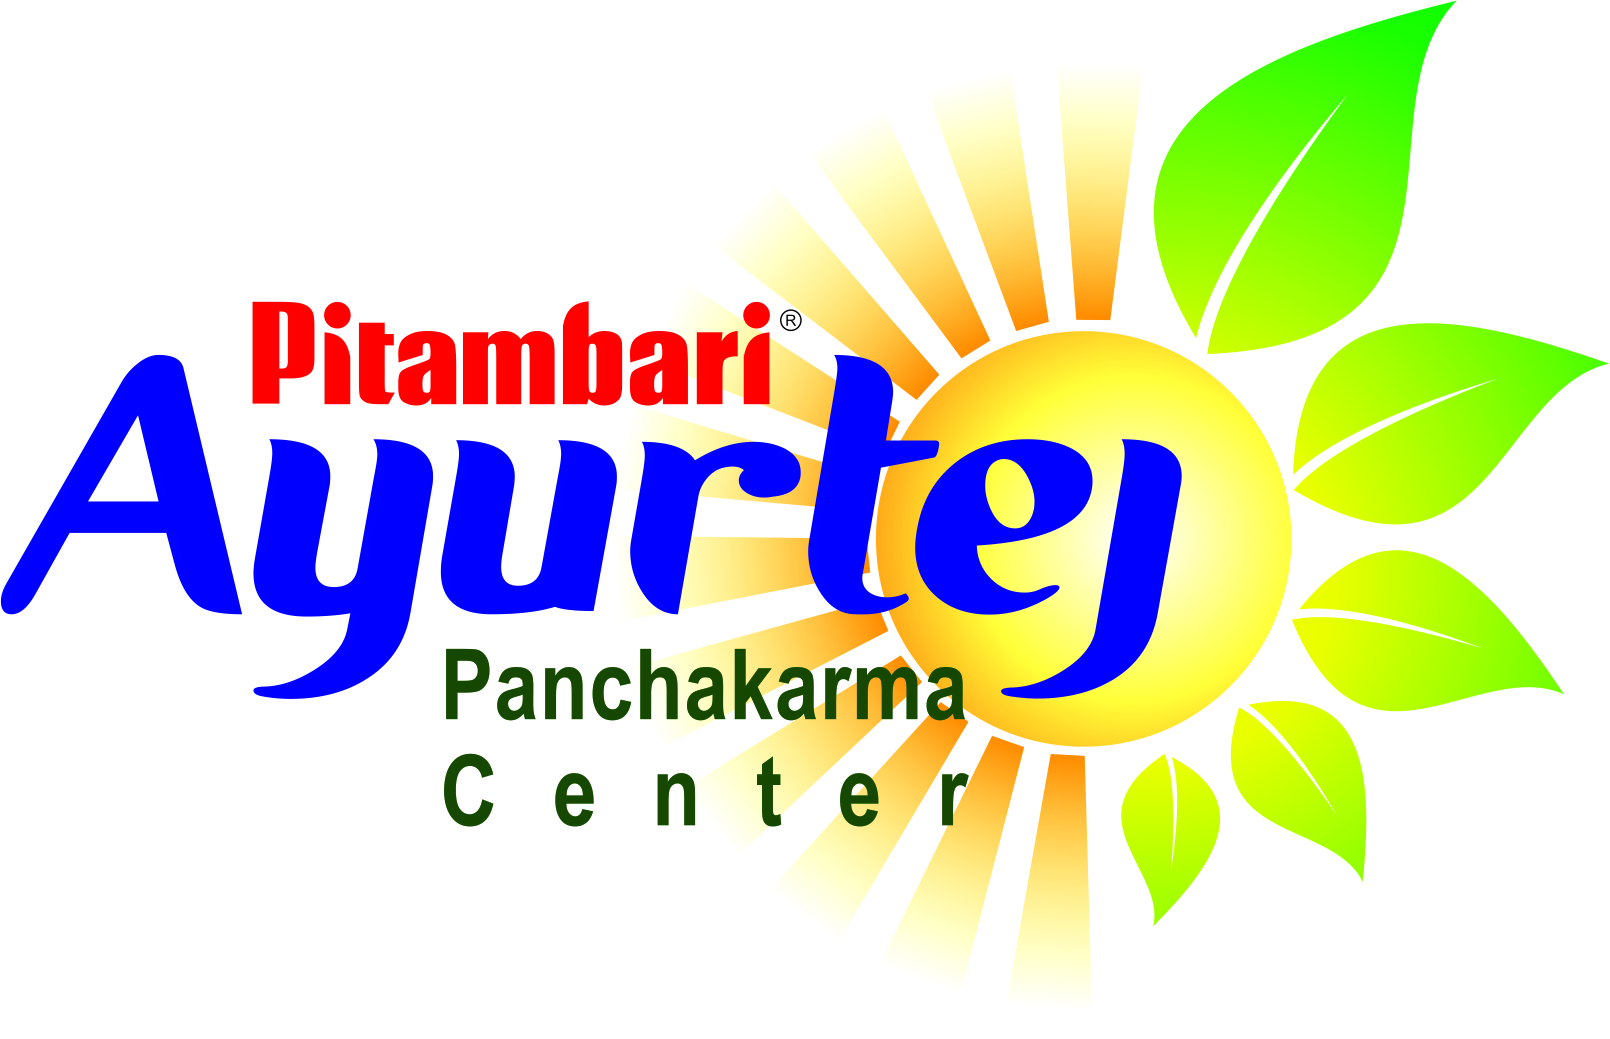 Pitambari's Ayurtej Panchkarma Center